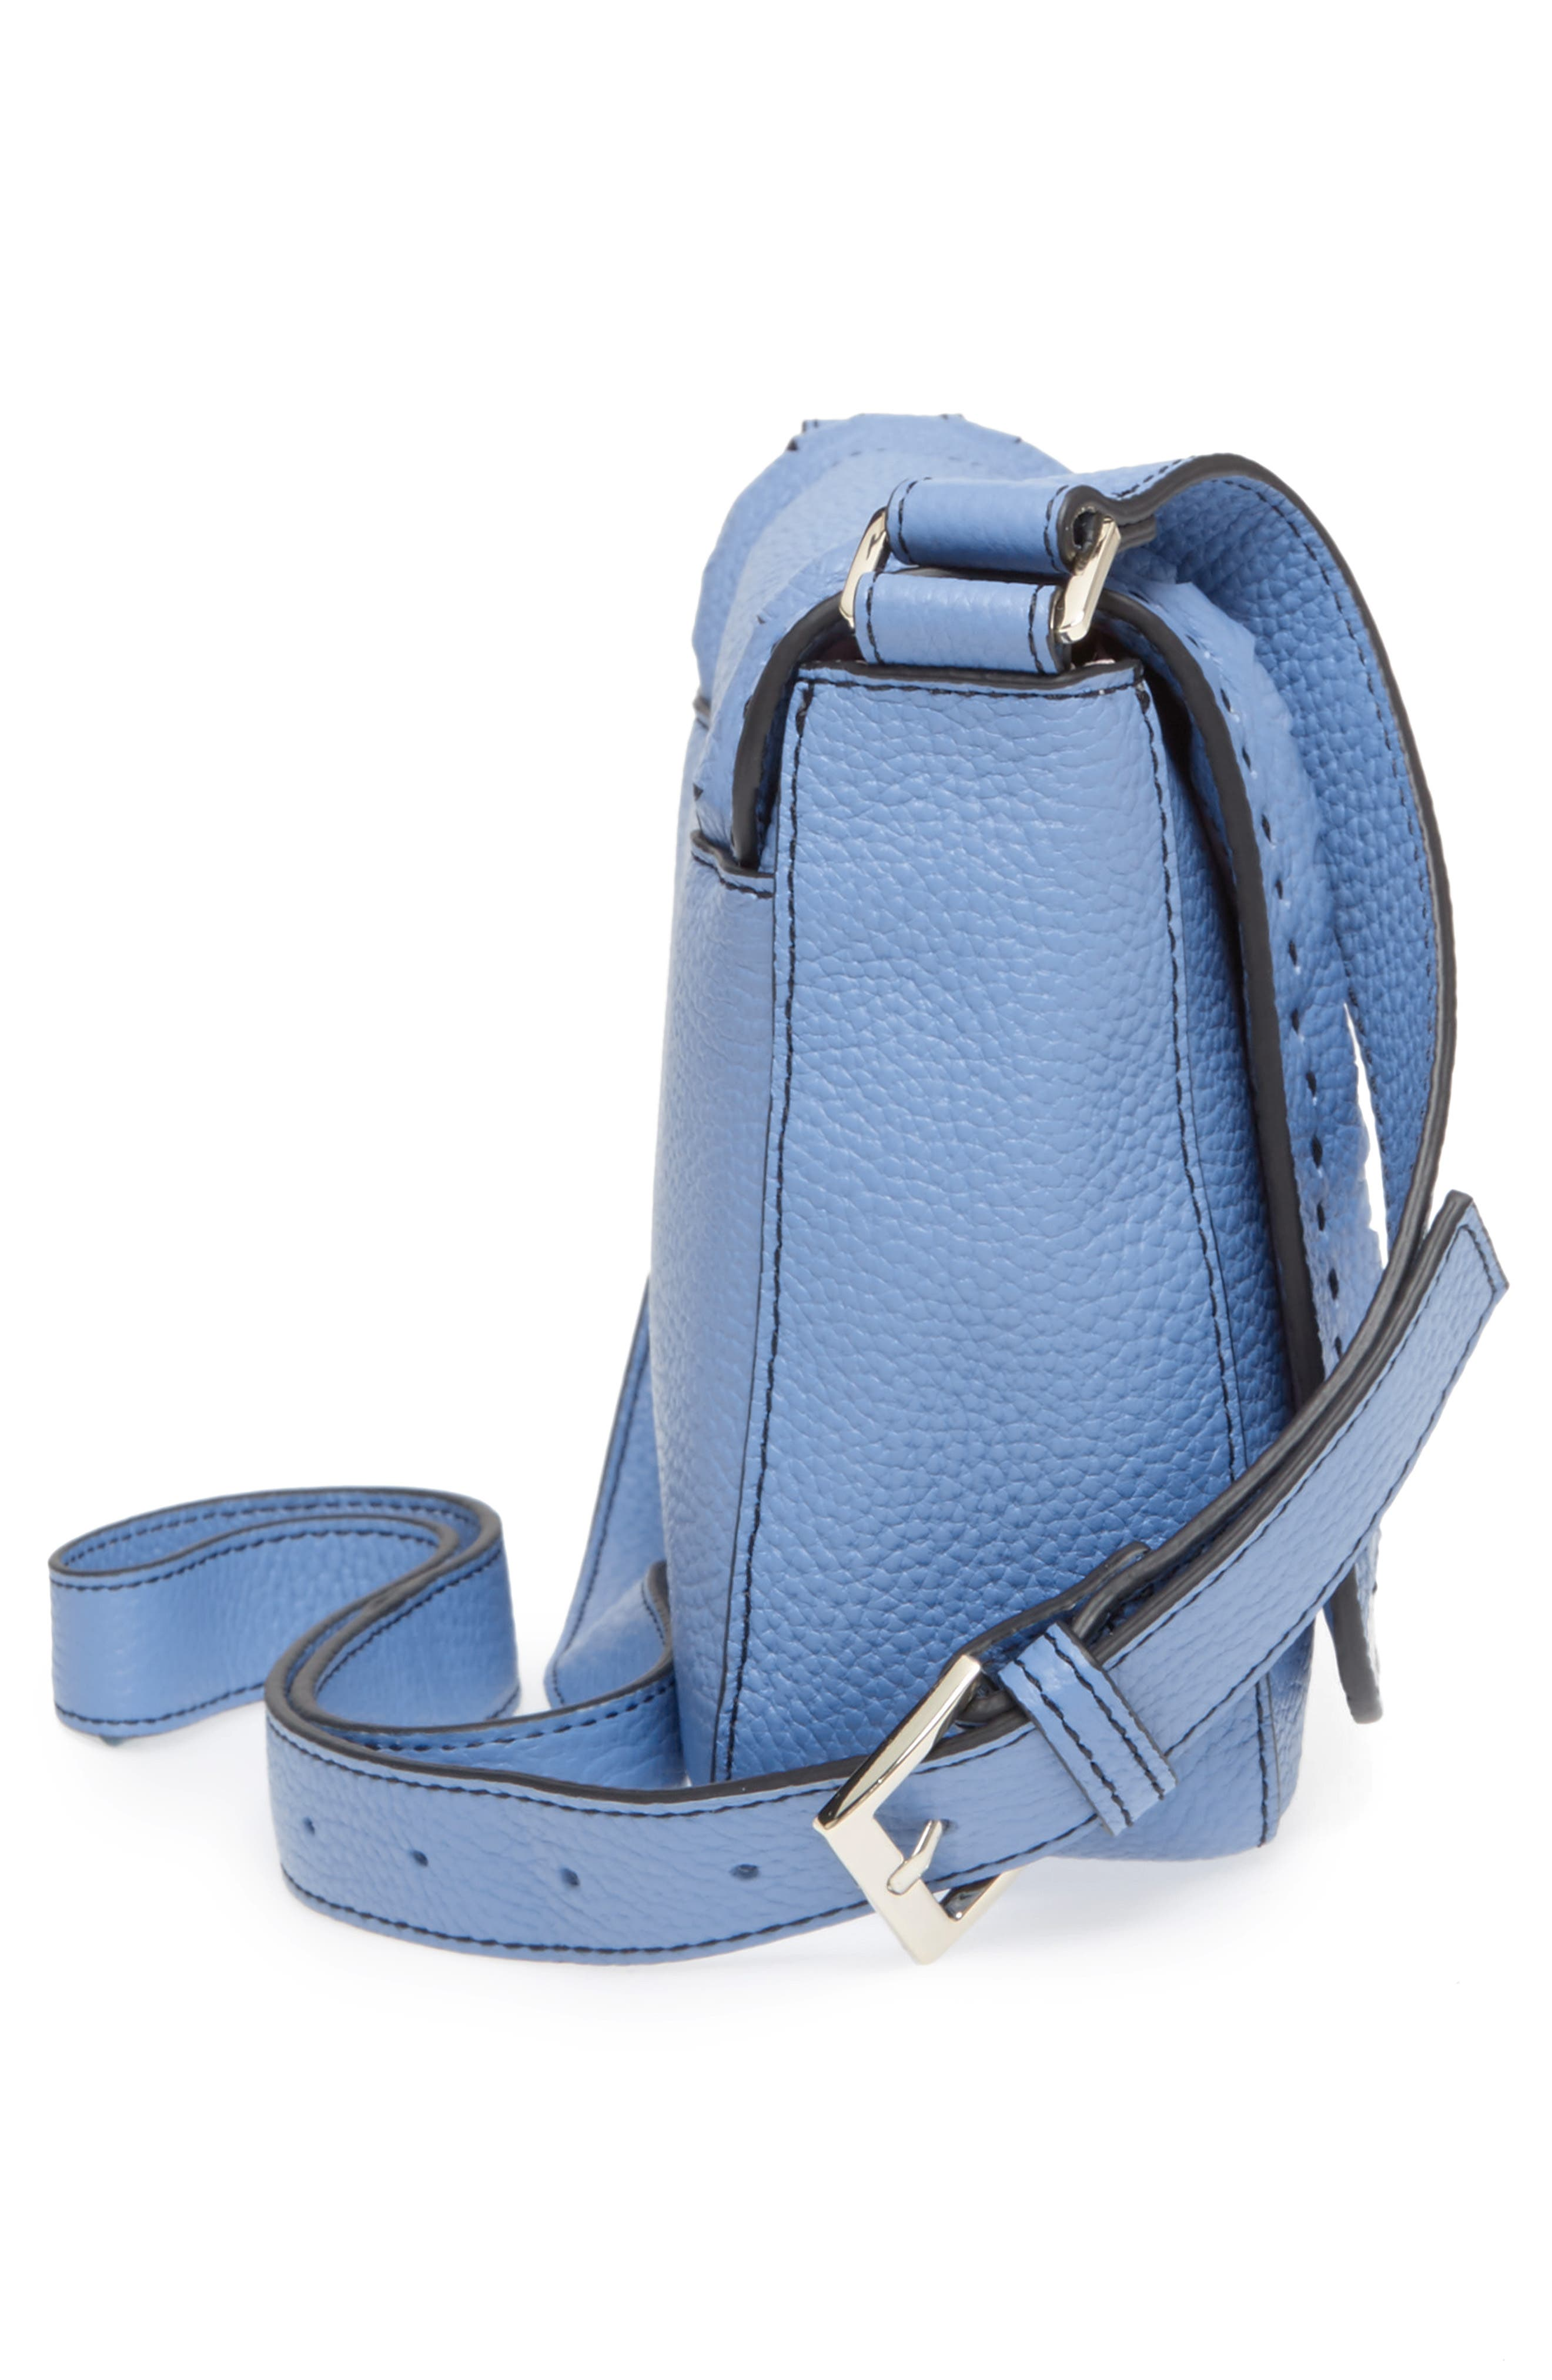 Tippi Leather Crossbody Bag,                             Alternate thumbnail 14, color,